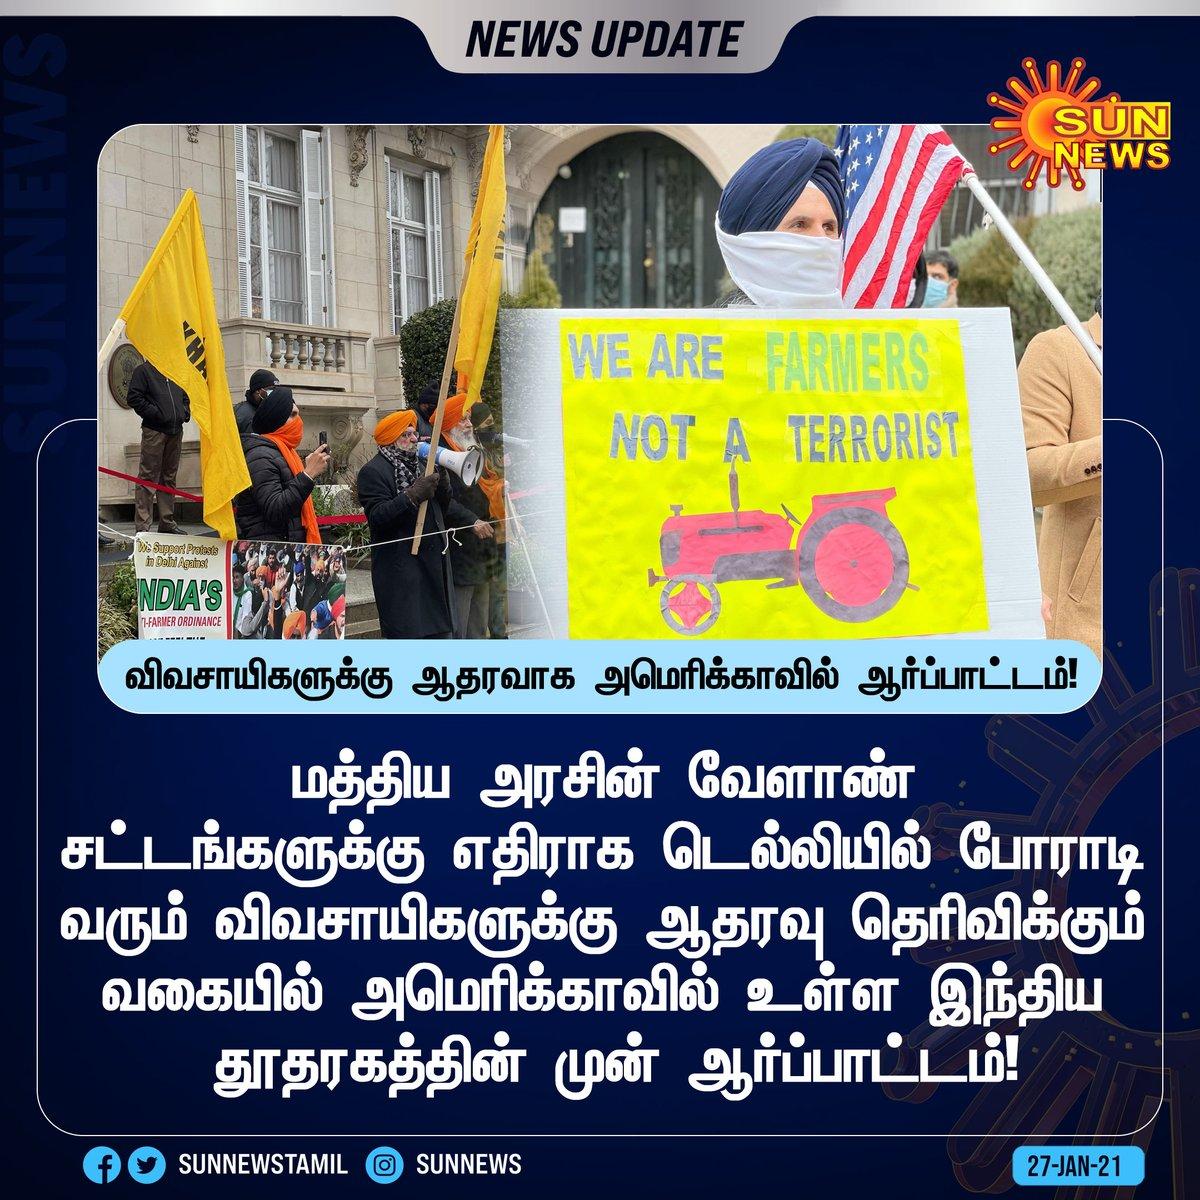 #NEWSUPDATE | இந்திய விவசாயிகளுக்கு ஆதரவாக அமெரிக்காவில் ஆர்ப்பாட்டம்!  #SunNews | #DelhiFarmersProtest | #America